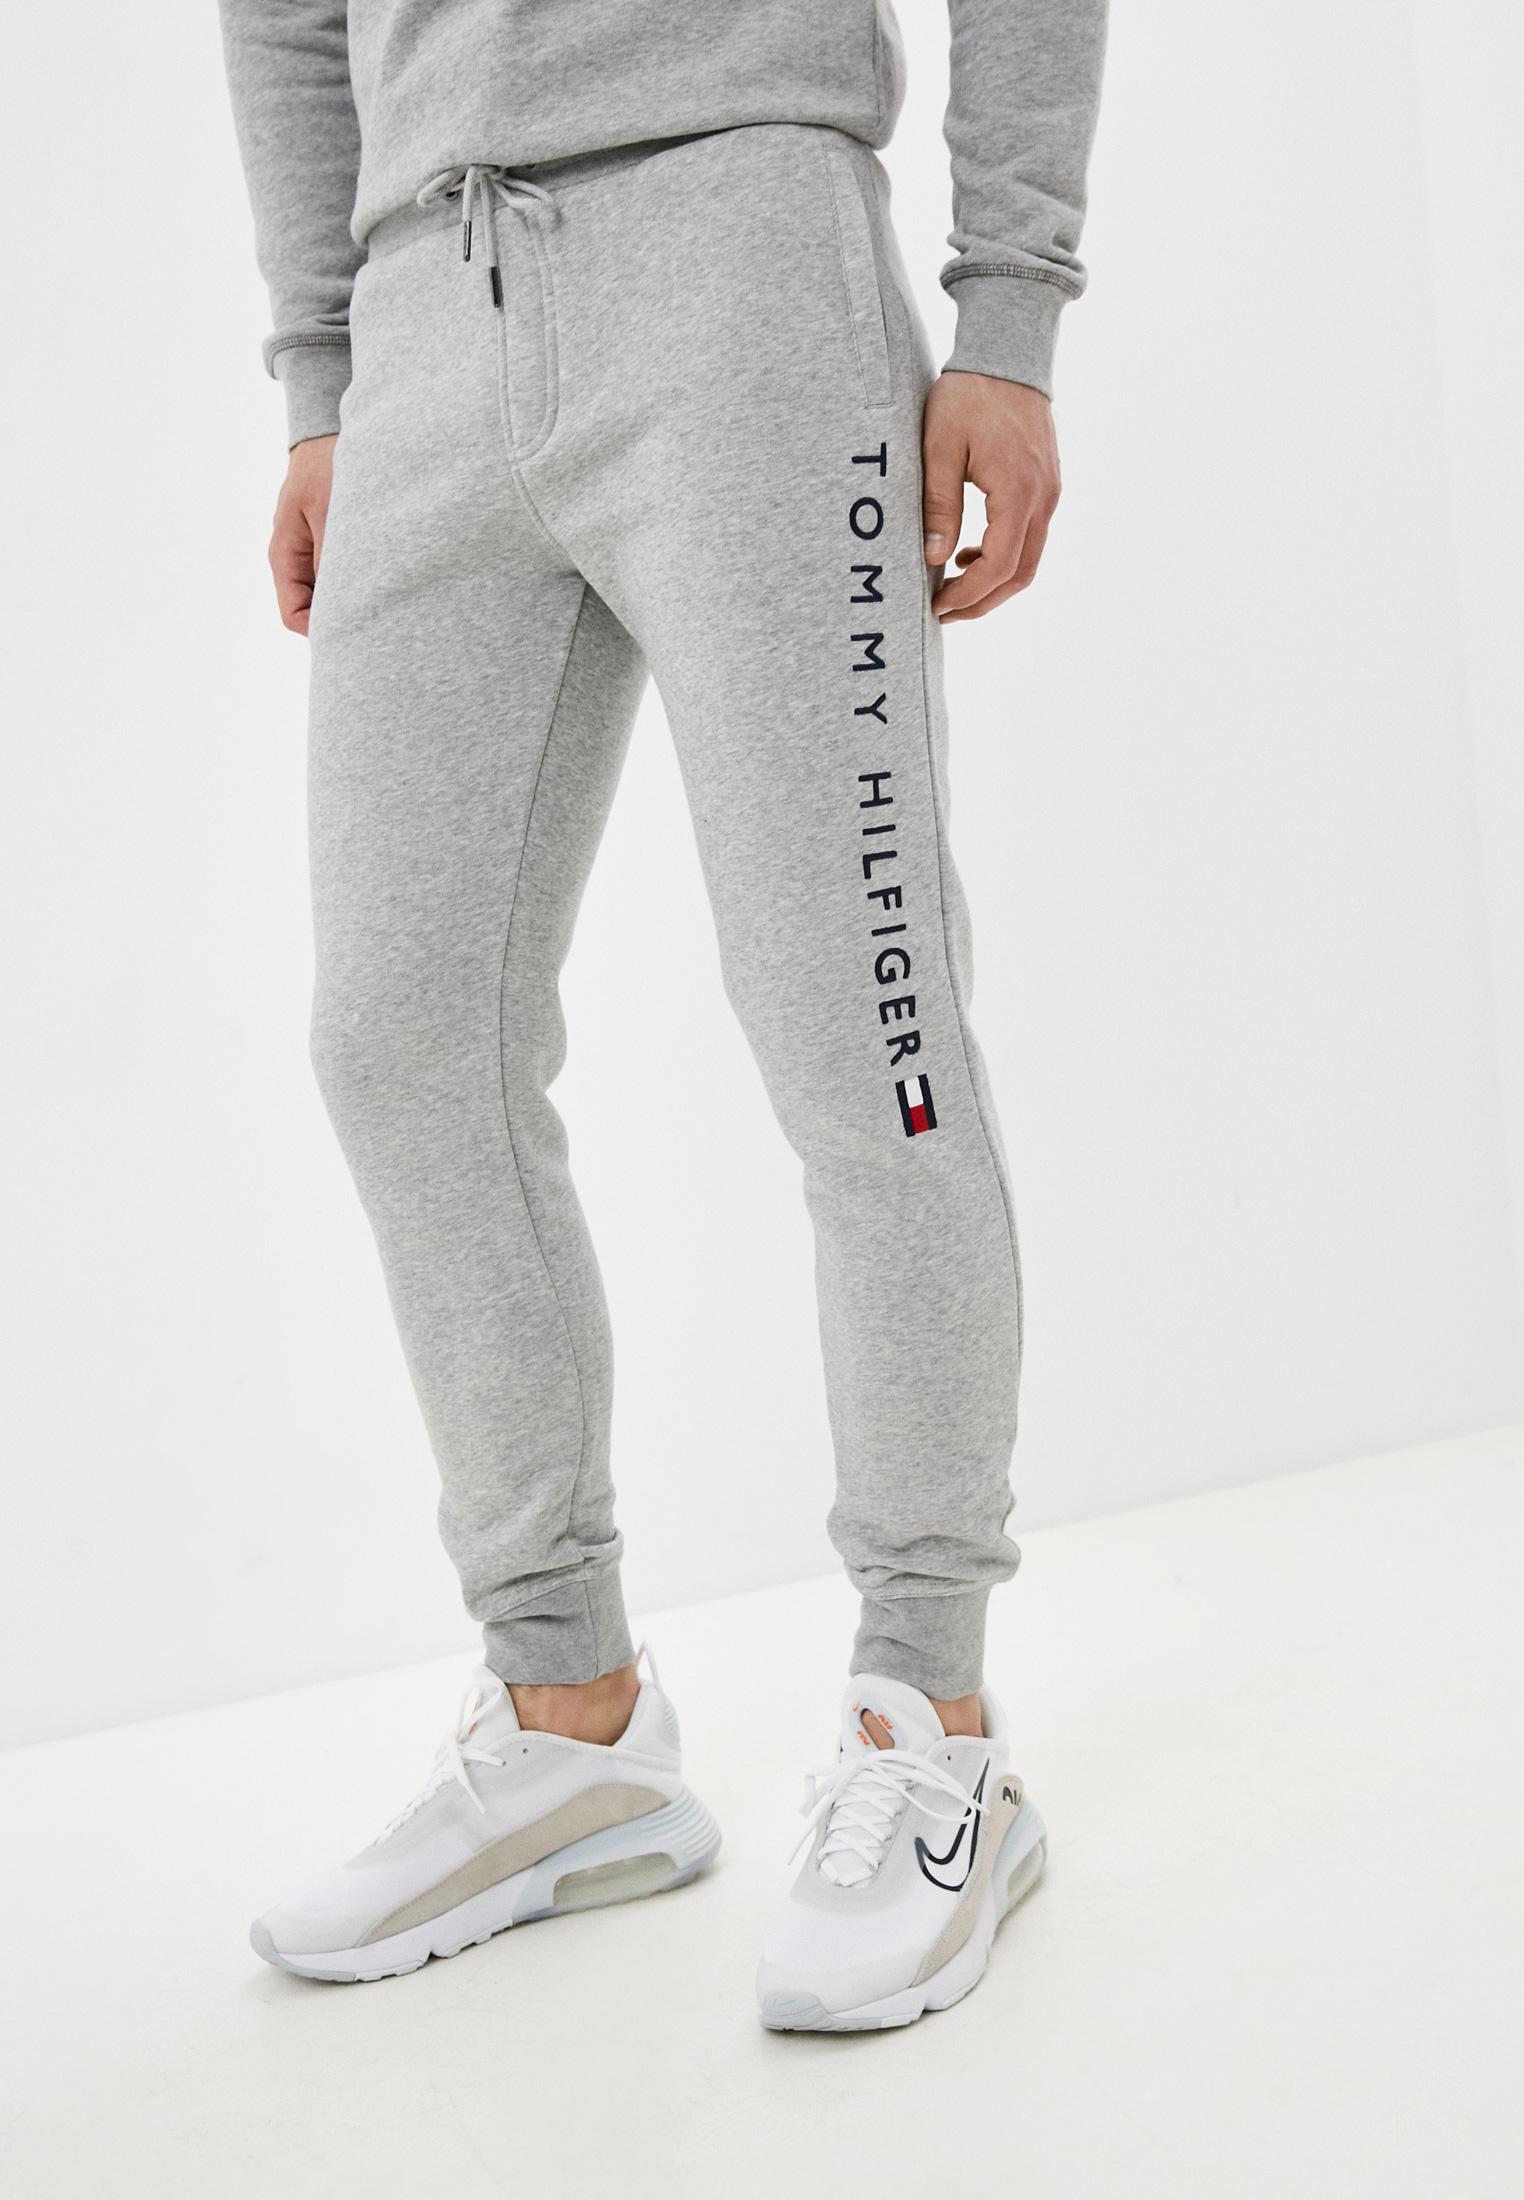 Мужские спортивные брюки Tommy Hilfiger (Томми Хилфигер) MW0MW18485